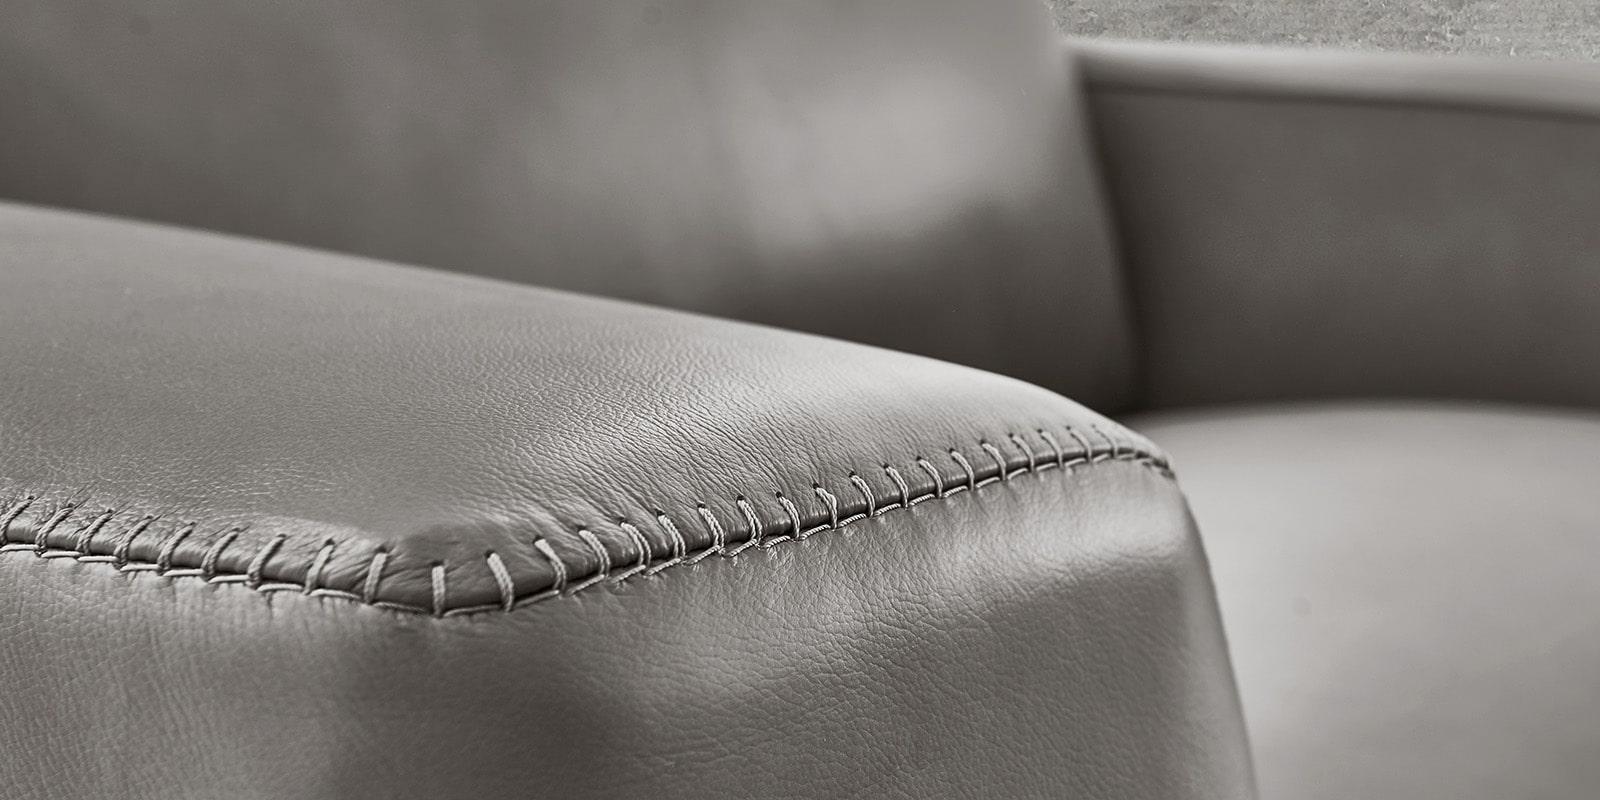 Moebella24 - 1,5-Sitzer - Sessel - Sofa - Barcelona - Leder - Grau - Skandinavisches - Design - Punto - cavallo - Nähte - Detailaufnahme